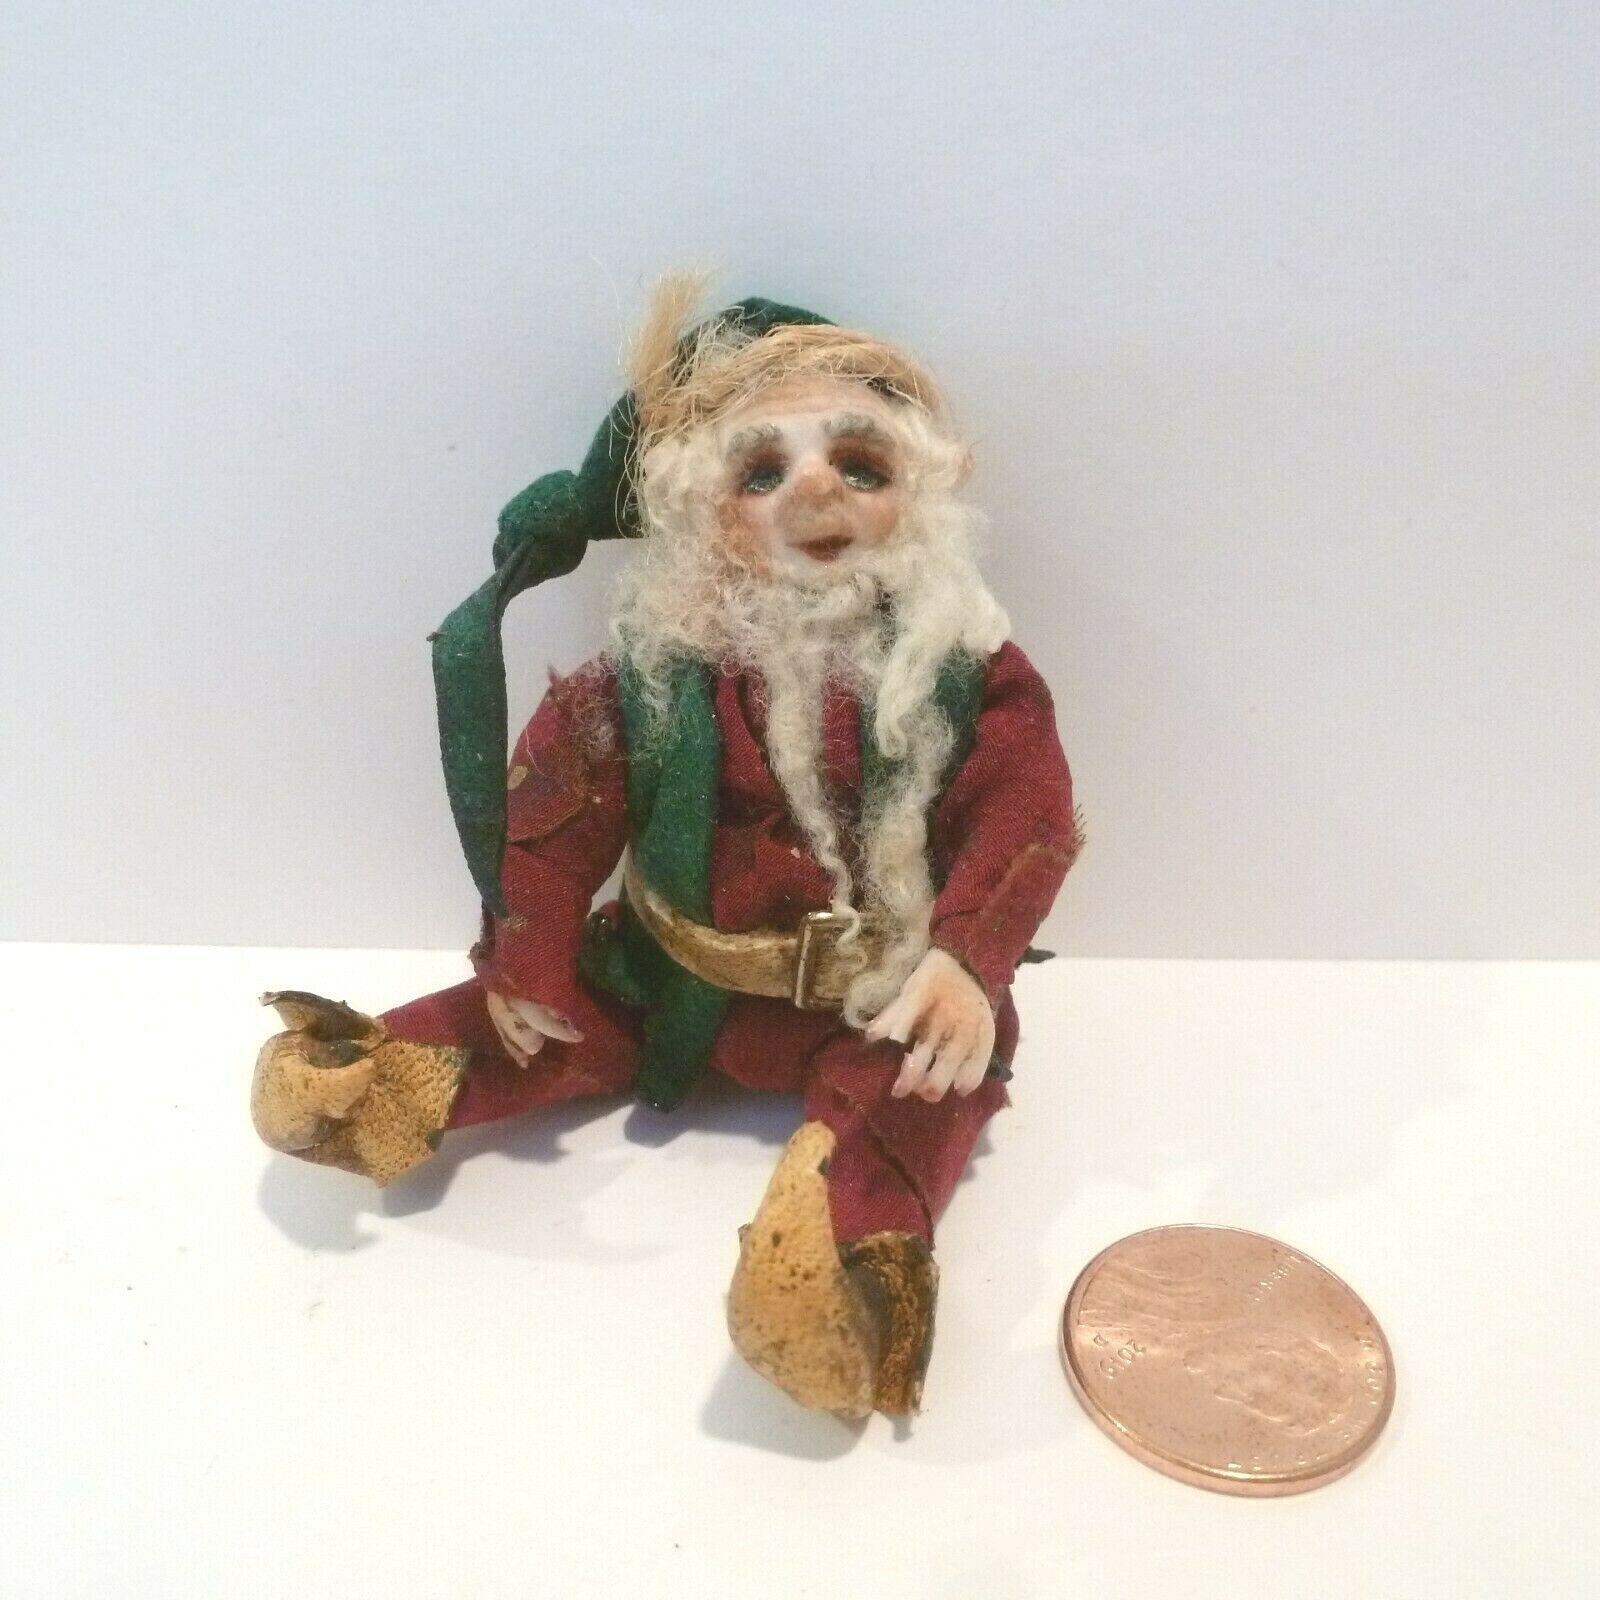 Helen Hartzell Miniatura Muñeca Woodsy Elf excepcional